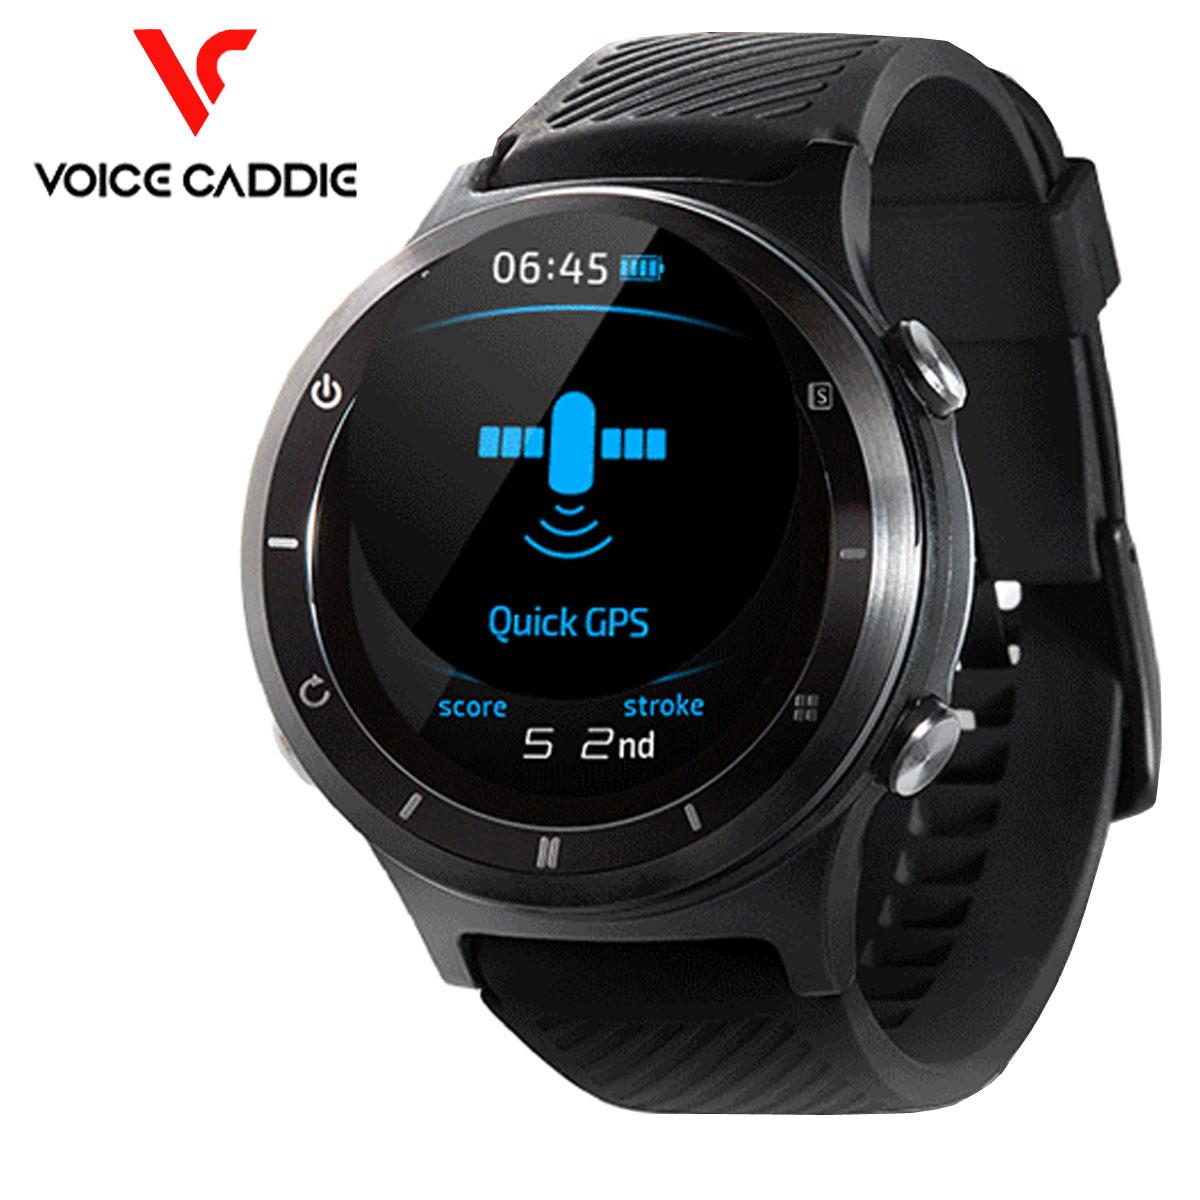 voice caddie(ボイスキャディ) プレミアム ゴルフウォッチ GPSゴルフナビ T6 「腕時計型GPS距離測定器」